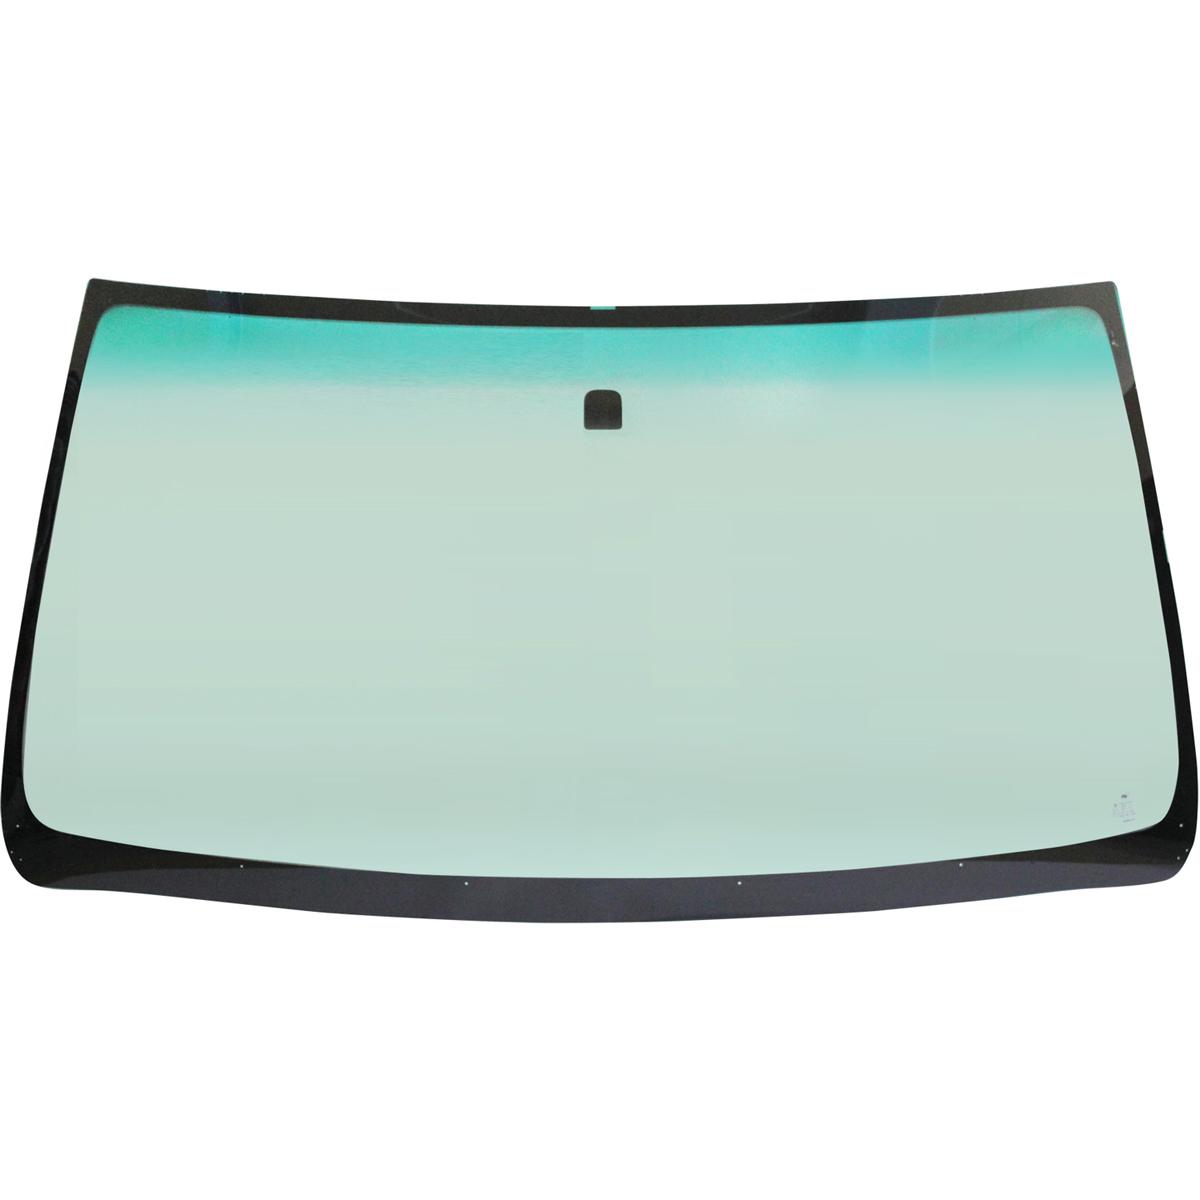 BMW Z3 ロードスター 2D CV用フロントガラスが送料無料!(※個人宅への配送はできません) BMW Z3 ロードスター 2D CV用フロントガラス 車両型式:E36(E-CH19) 年式:H.8- ガラス型式: ガラス色:グリーン ボカシ:グリーン